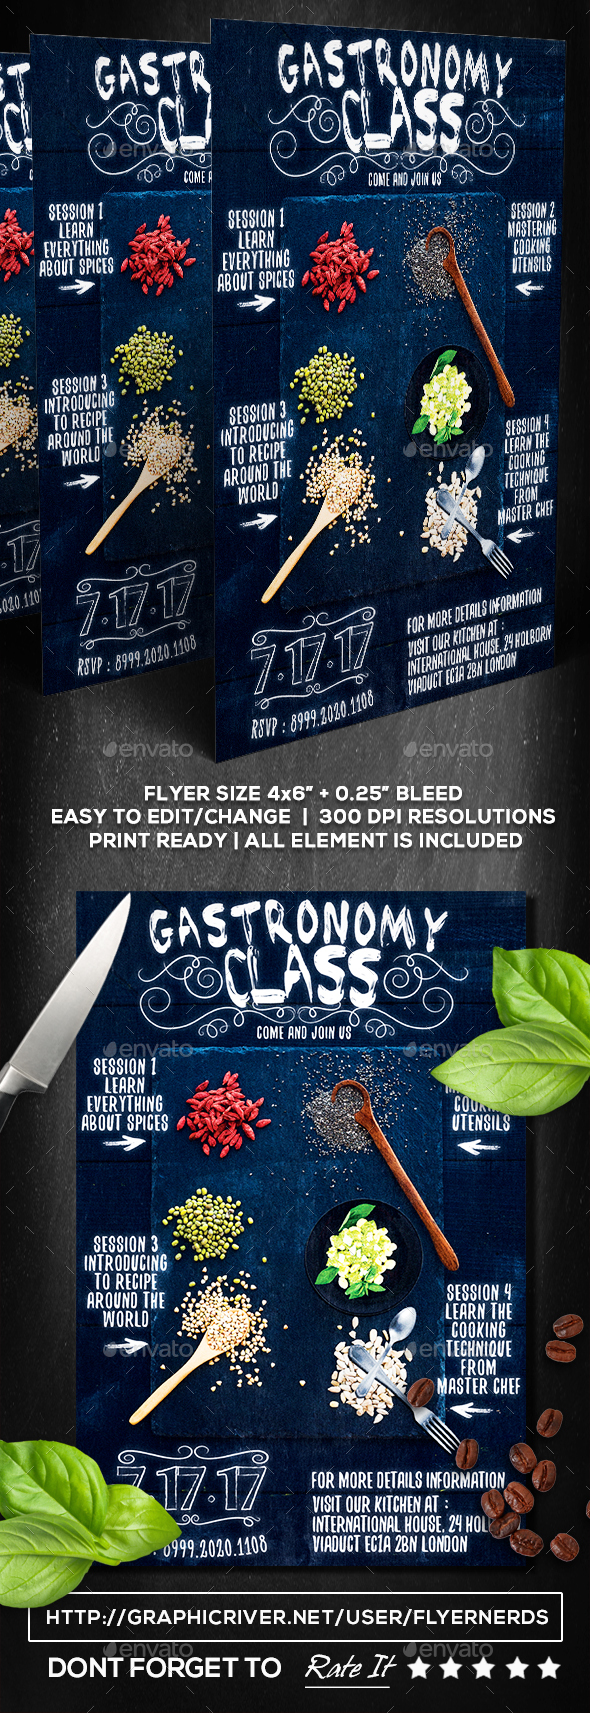 Gastronomy Class Flyer - Restaurant Flyers